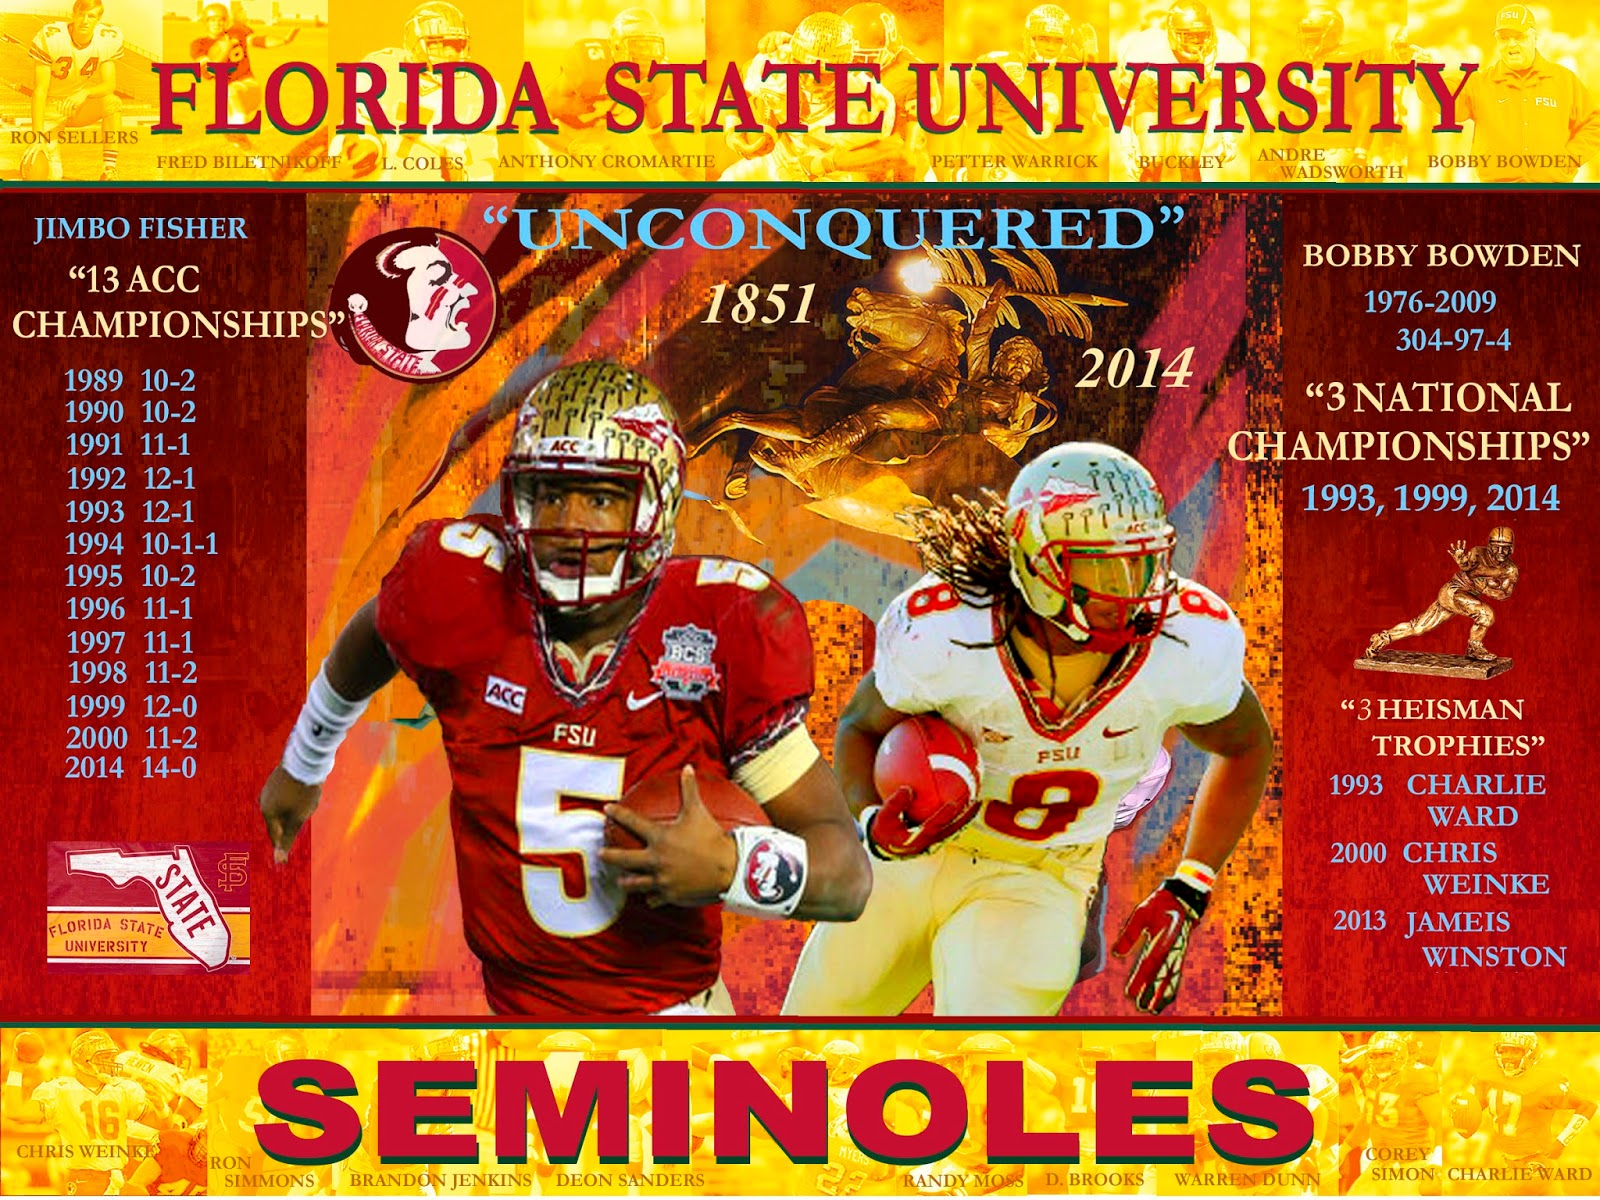 art of h edward brooks Florida State Seminoles 2014 National Champs 1600x1200